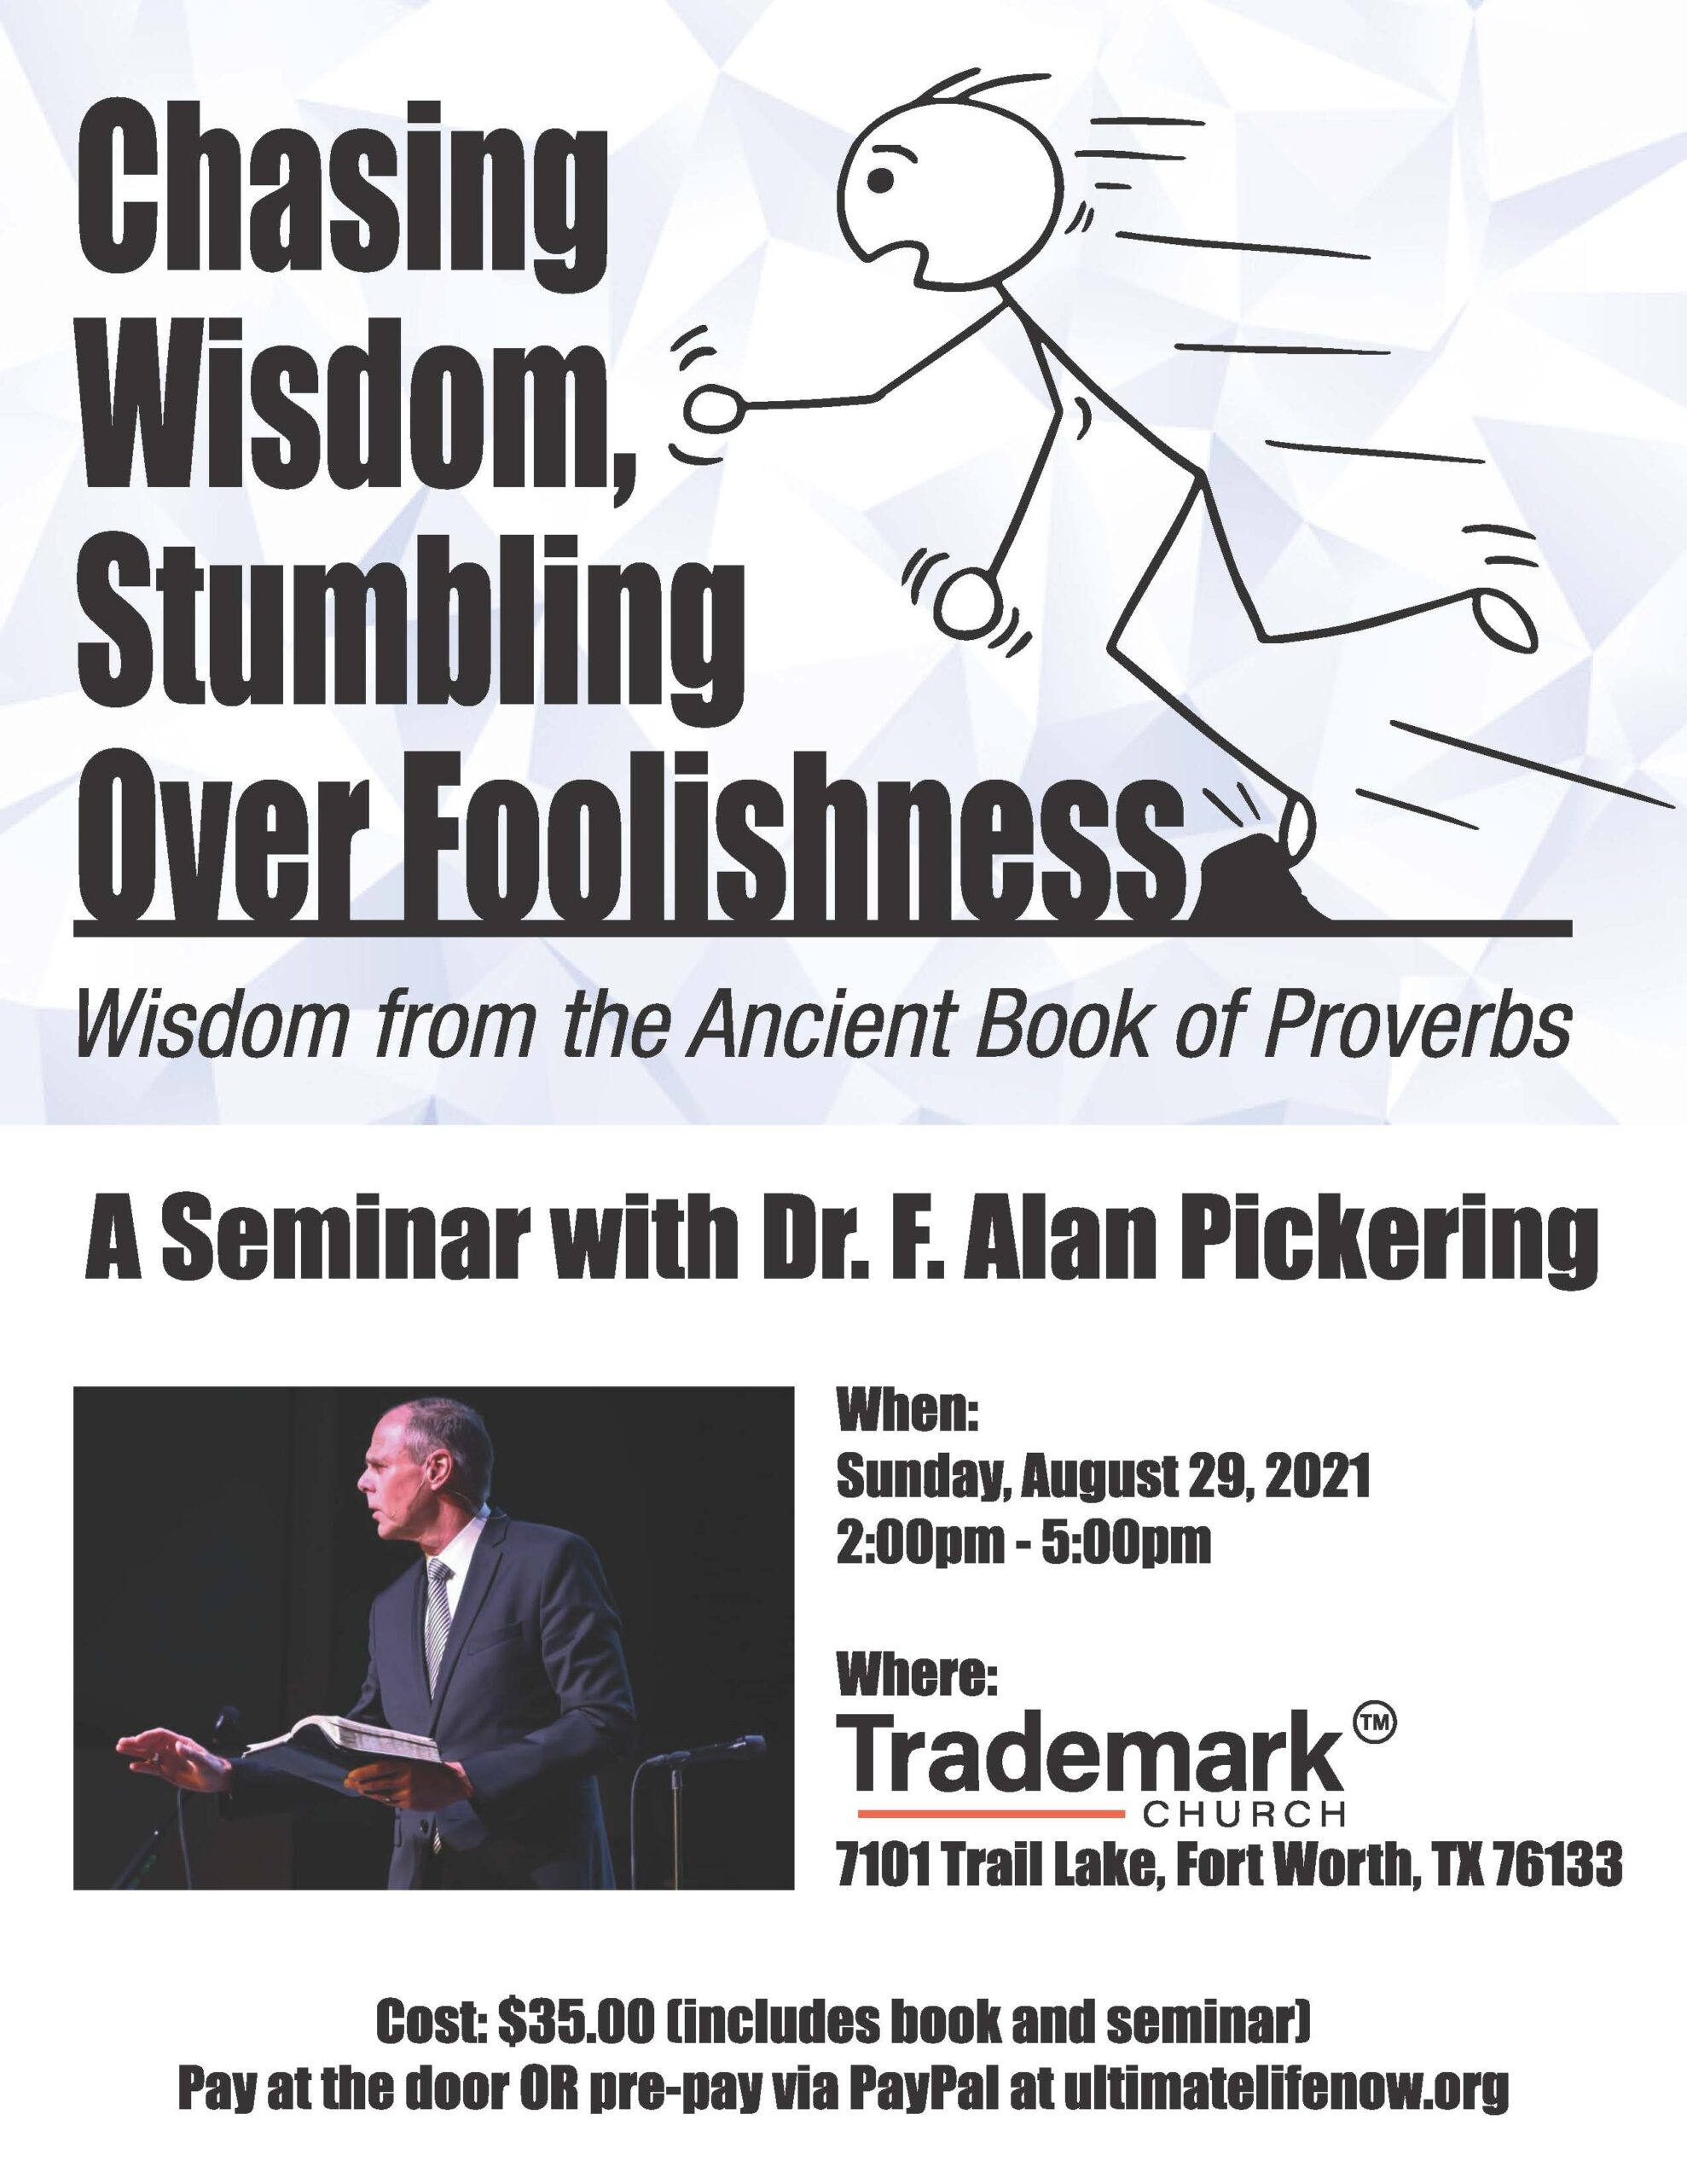 Chasing Wisdom Stumbling Over Foolishness copy